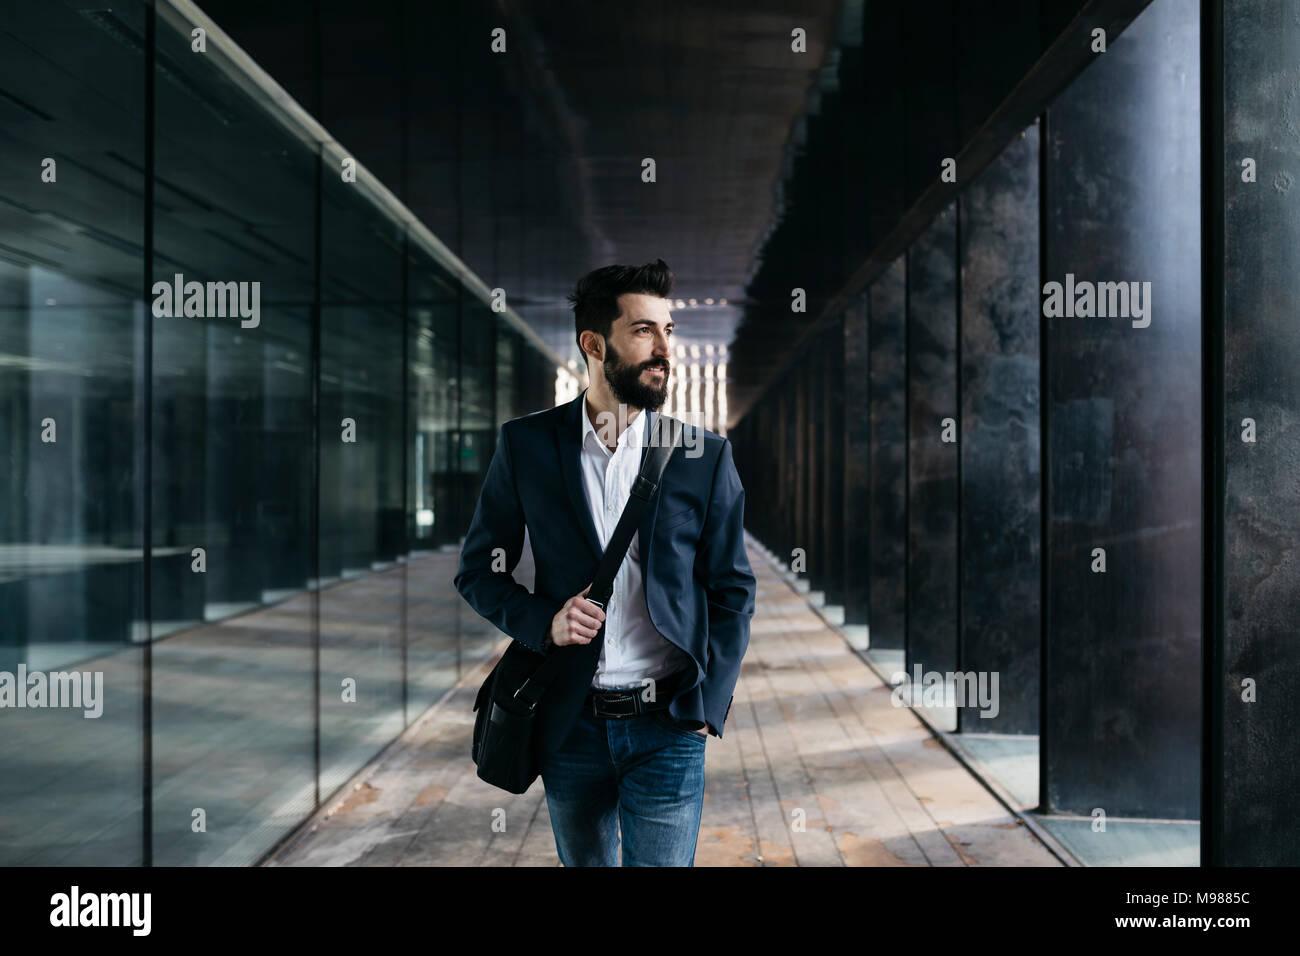 Empresario caminando arcade Imagen De Stock